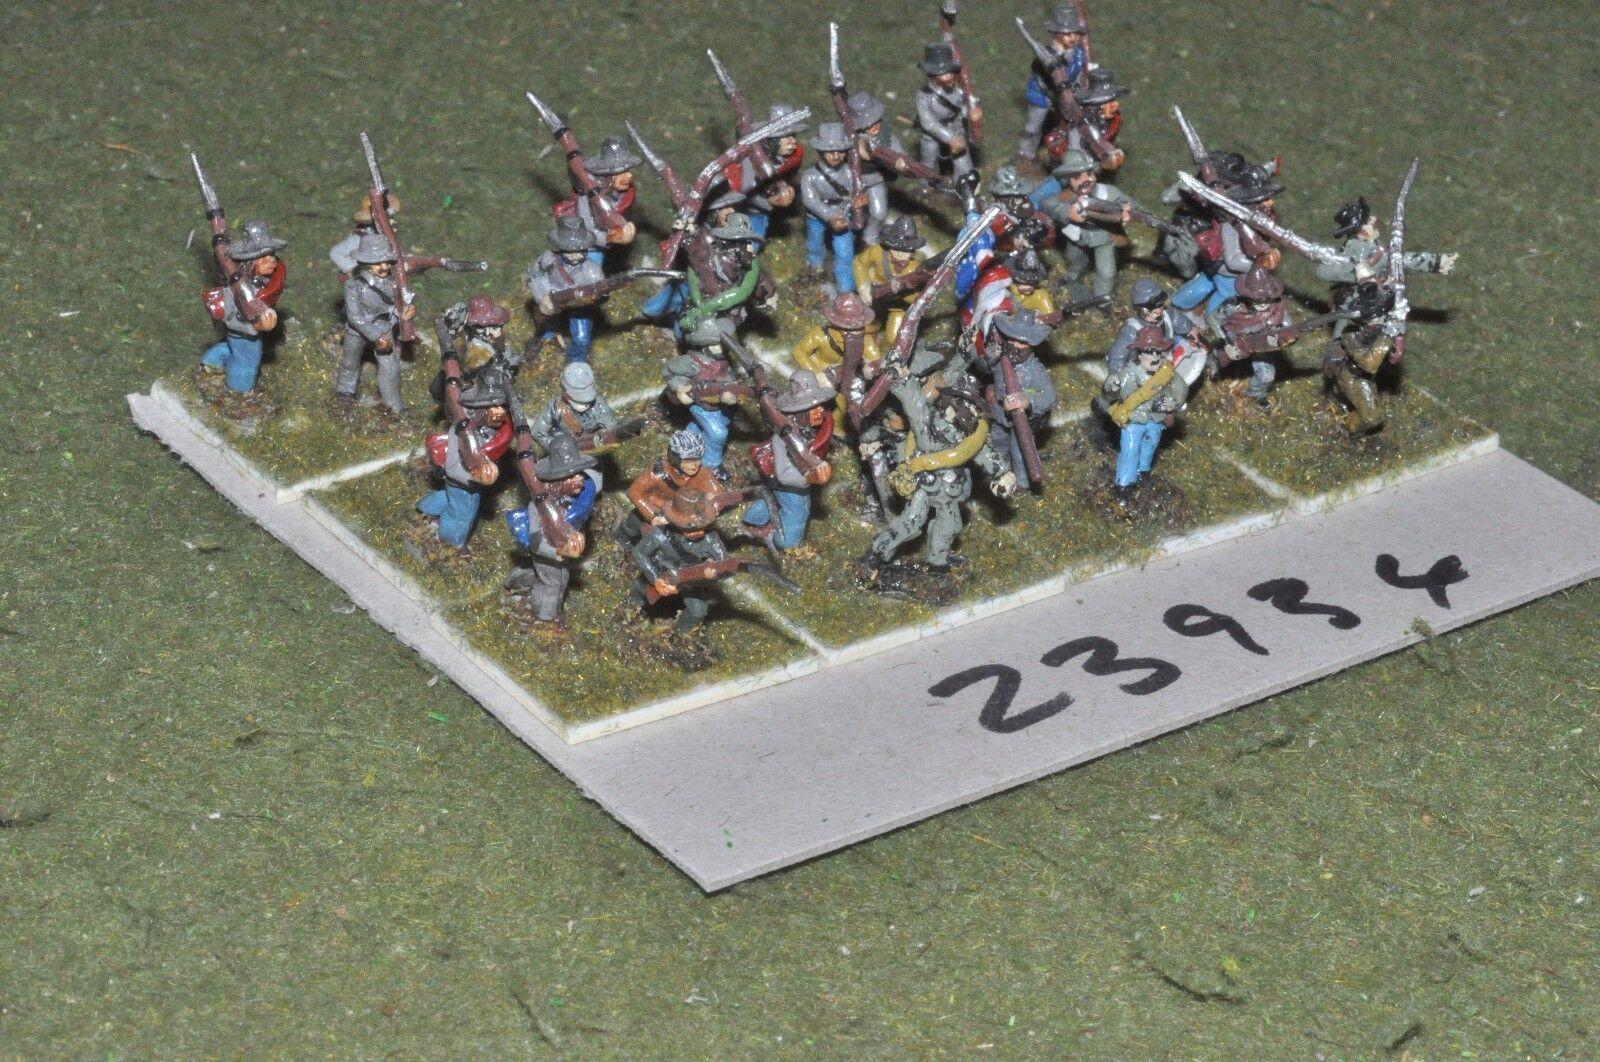 15mm ACW   confederate - regiment 36 figures - inf (23934)